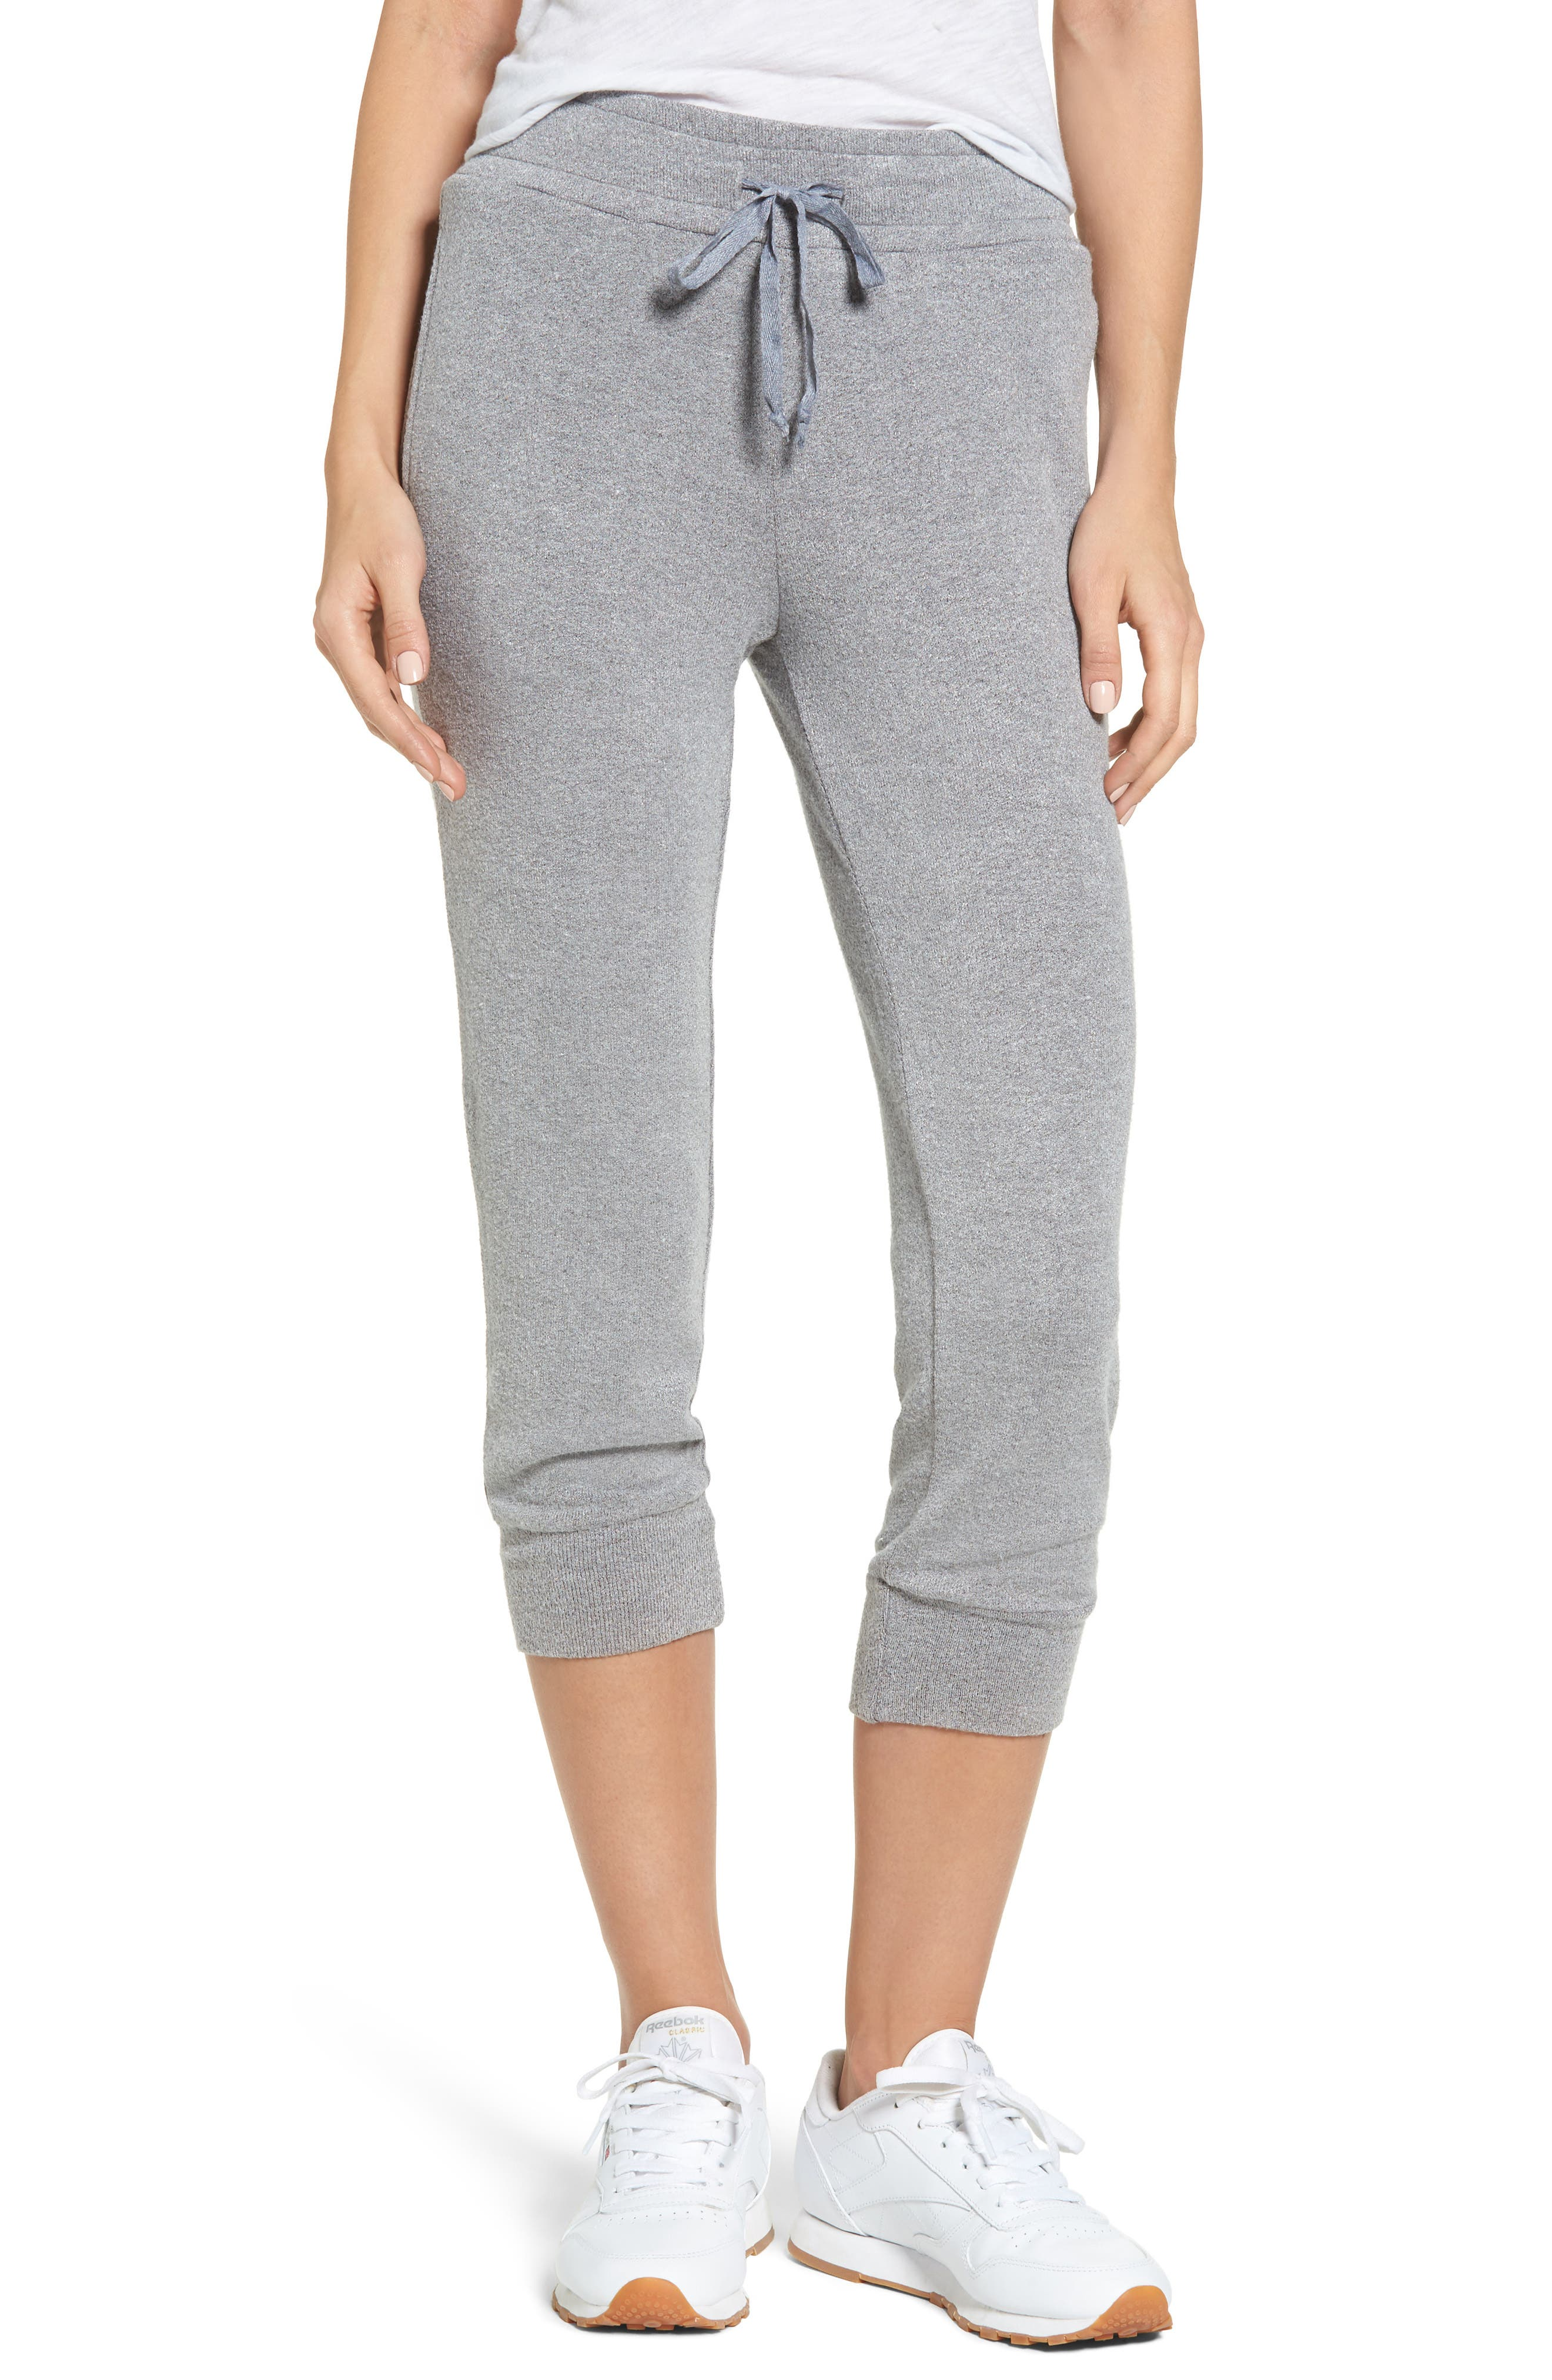 Alternate Image 1 Selected - Lira Clothing Flint Fleece Crop Jogger Pants